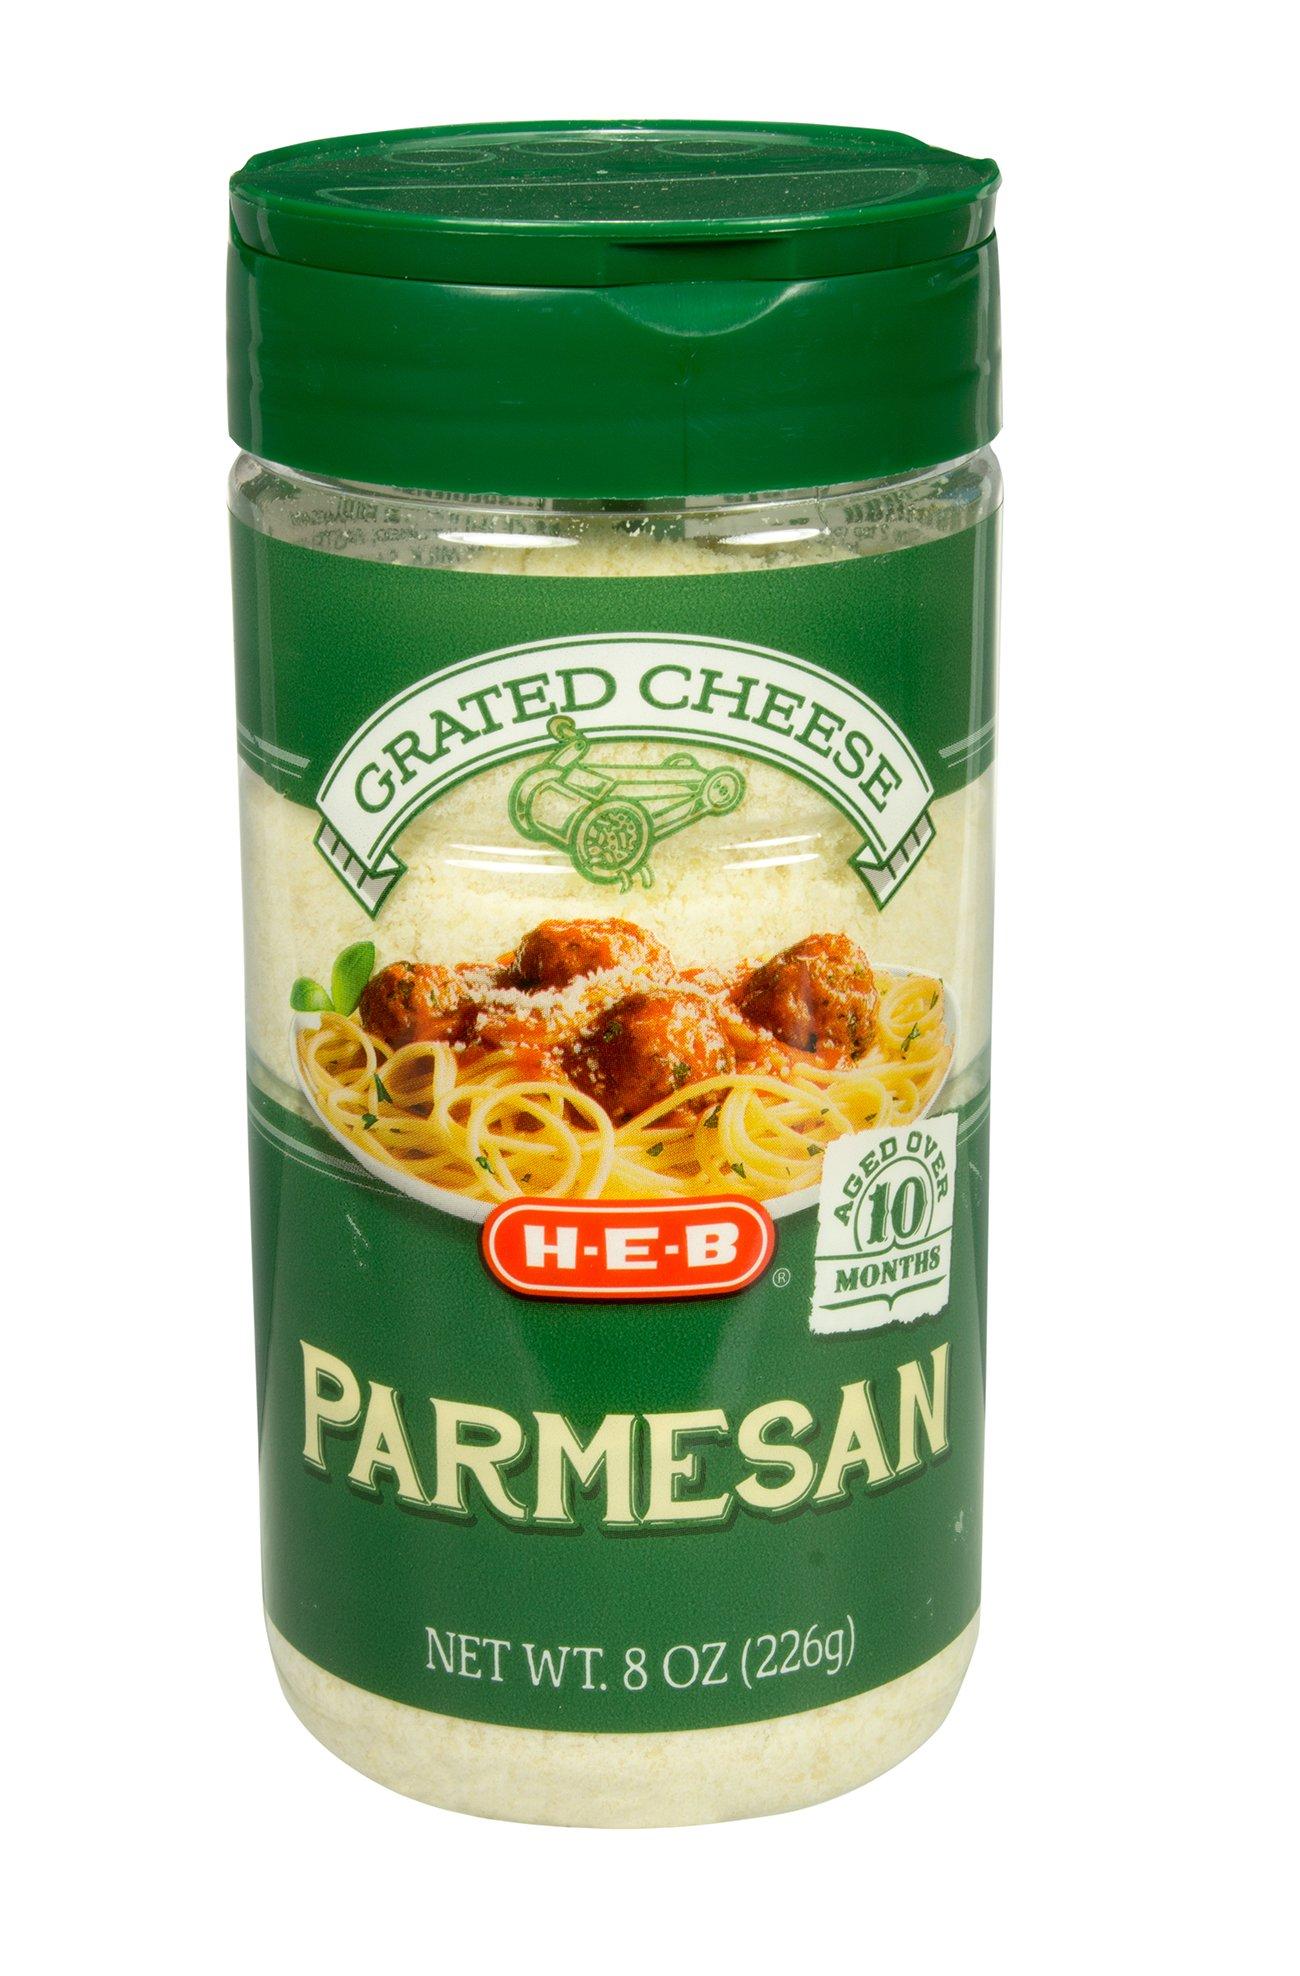 Fresh Gourmet Parmesan Cheese Crisps